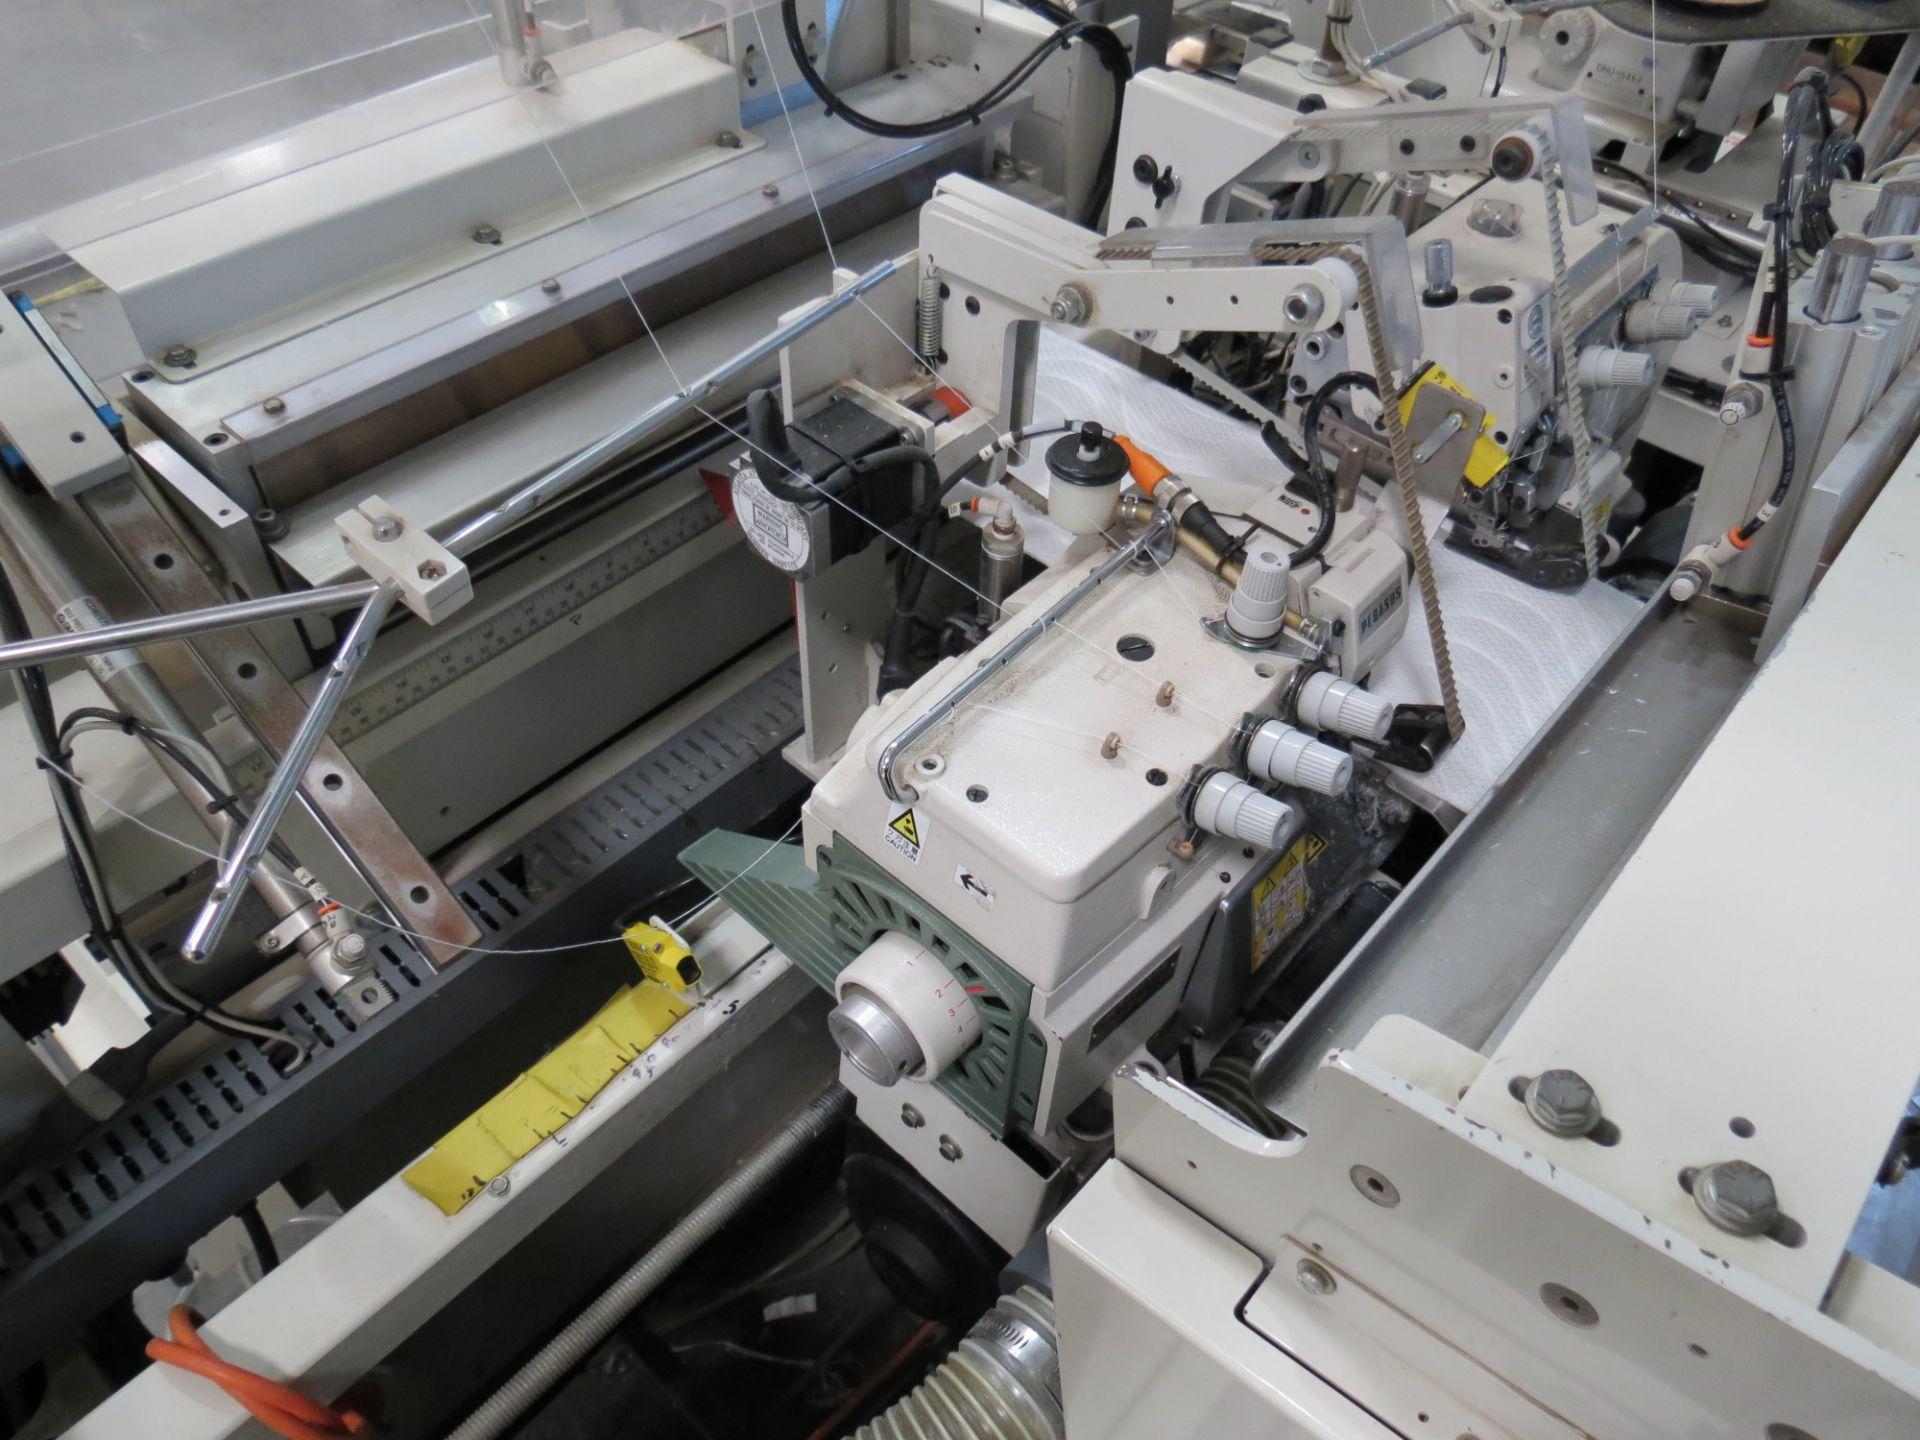 Atlanta Attachment Company, 4300BBorder/Attach Handles Sewing Machine, 220V, SN:209227071609, Juki - Image 8 of 11